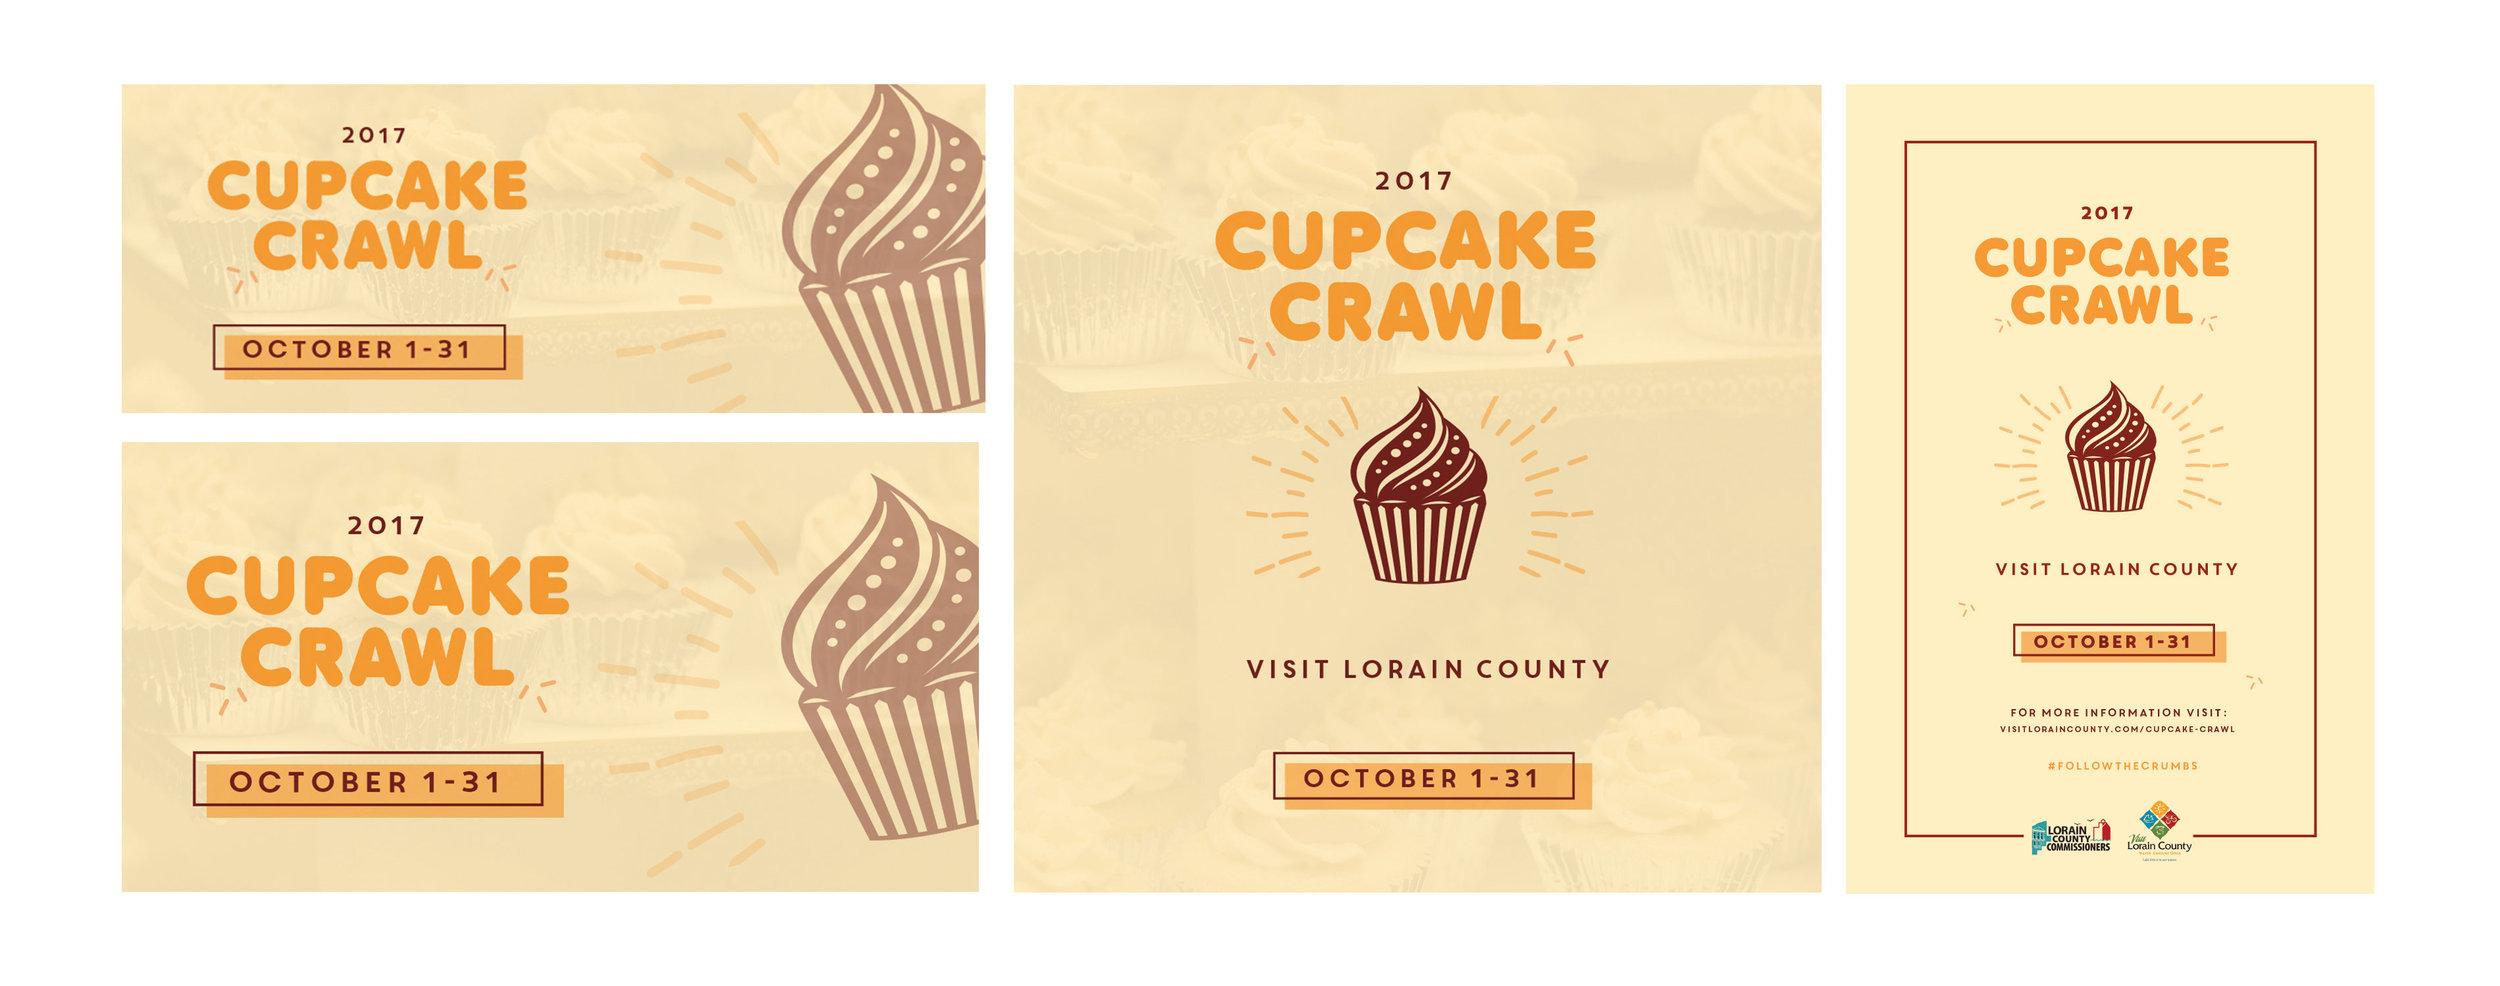 cupcakecrawl_3a.jpg